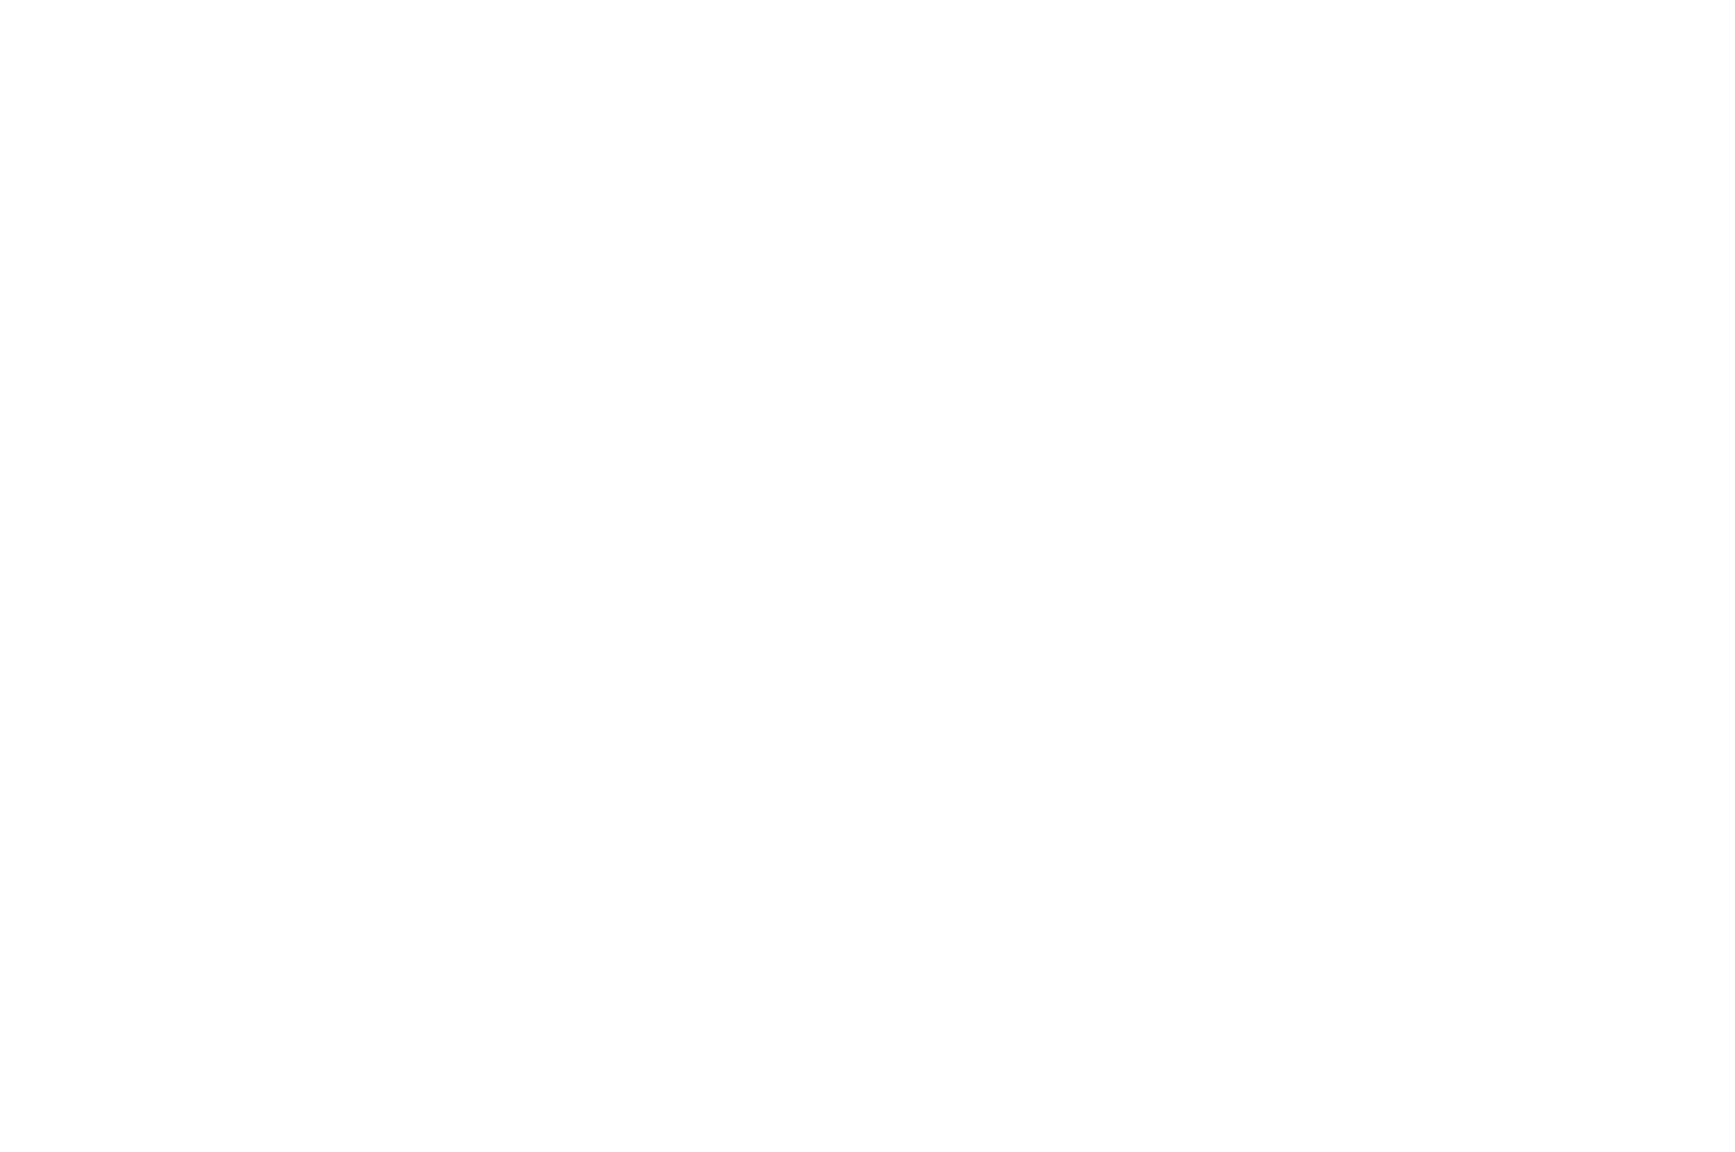 OFFICIAL SELECTION - Barcelona Planet Film Festival - 2016